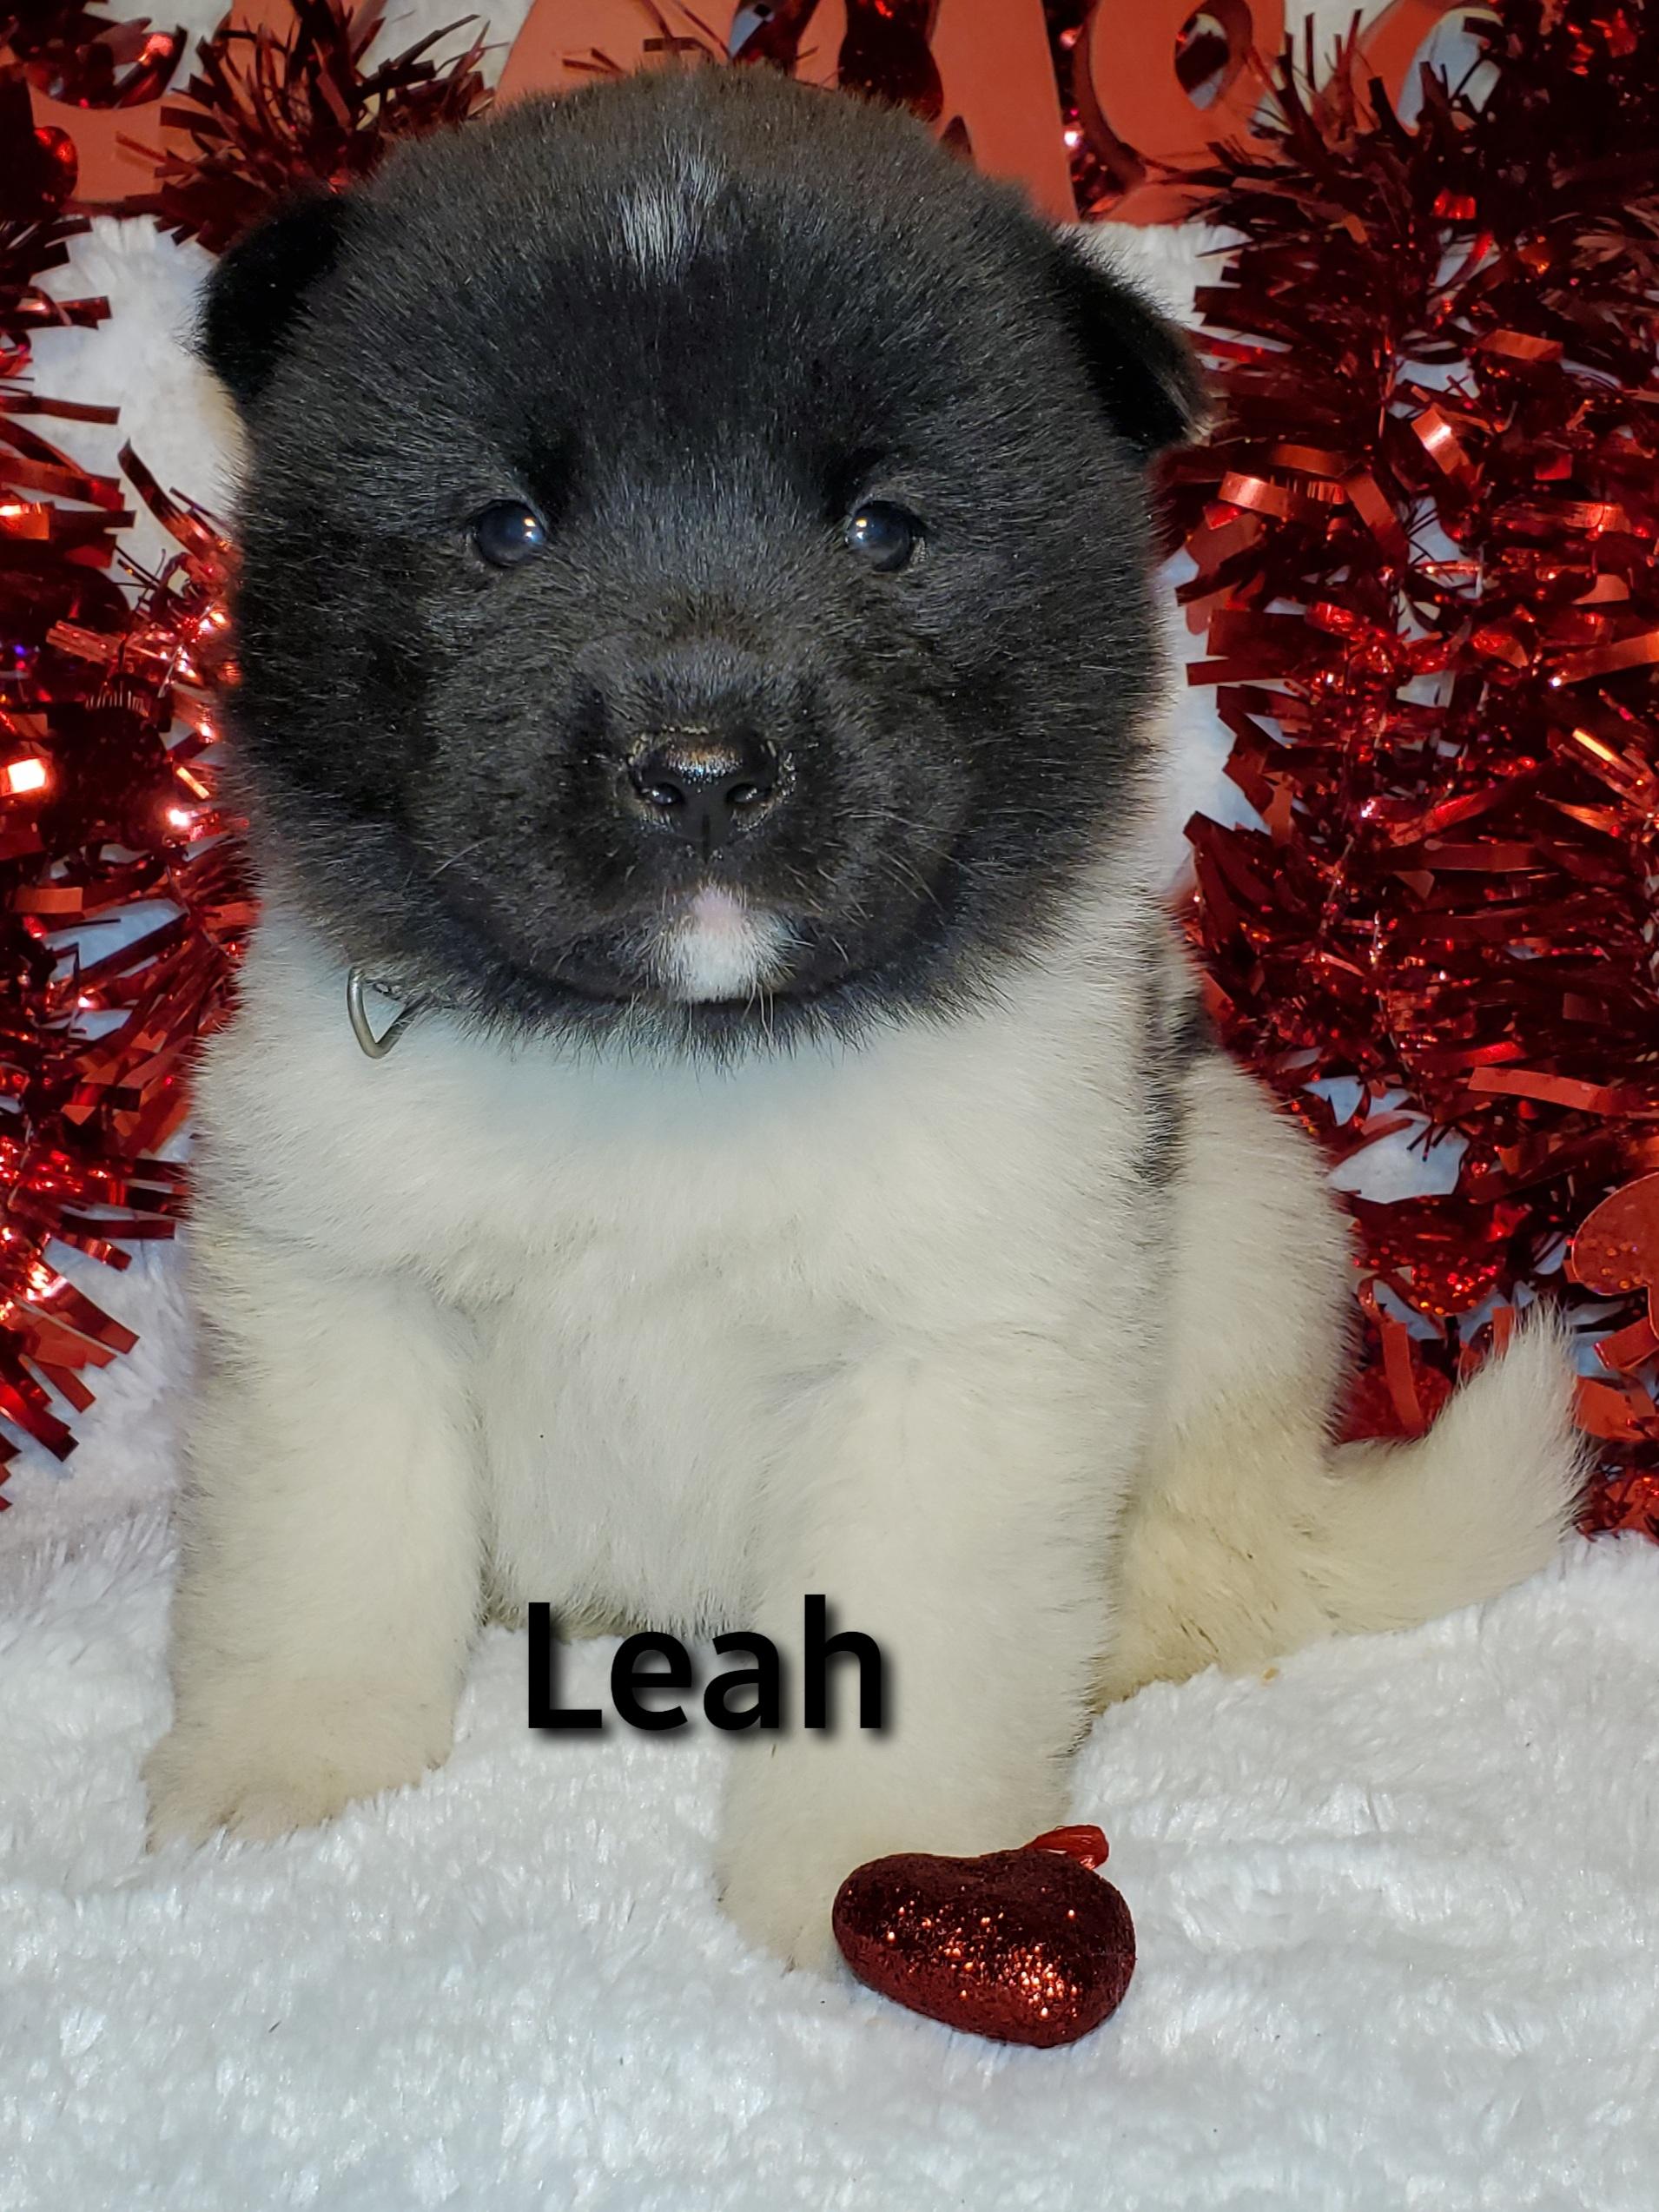 Leah front.jpg